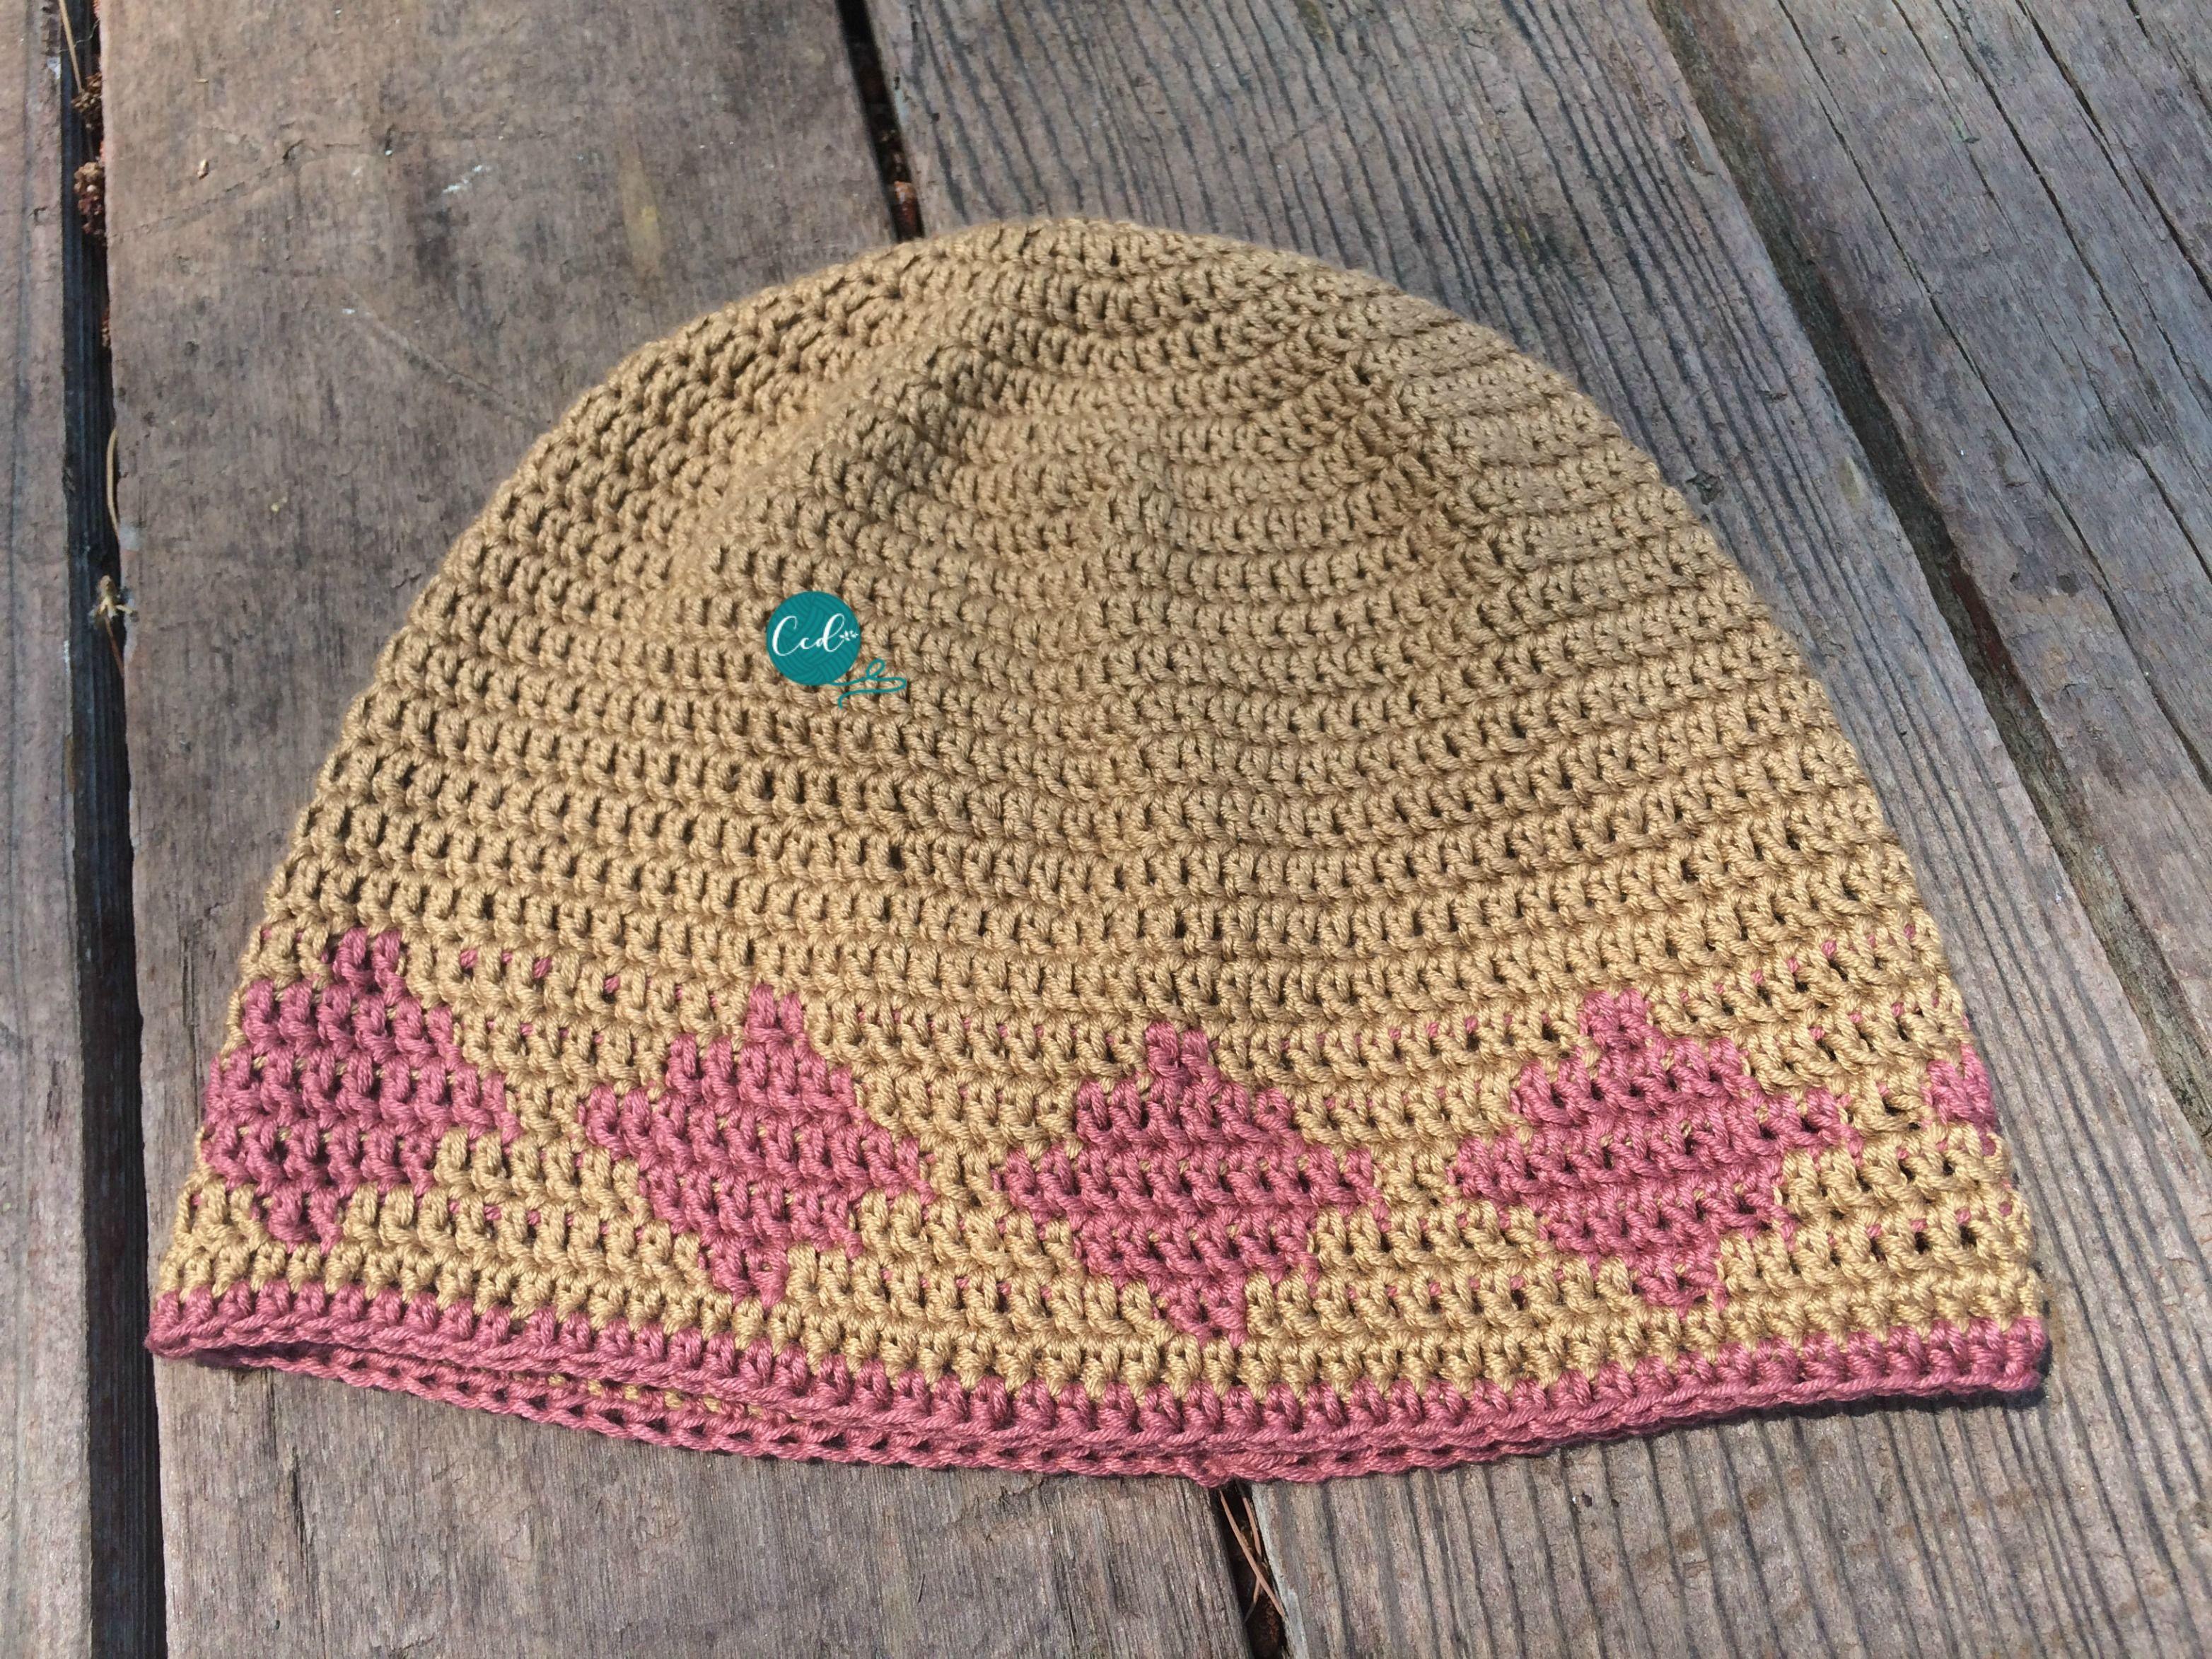 Crochet Summer Chemo Cap Pattern | Chemo caps pattern, Free crochet ...